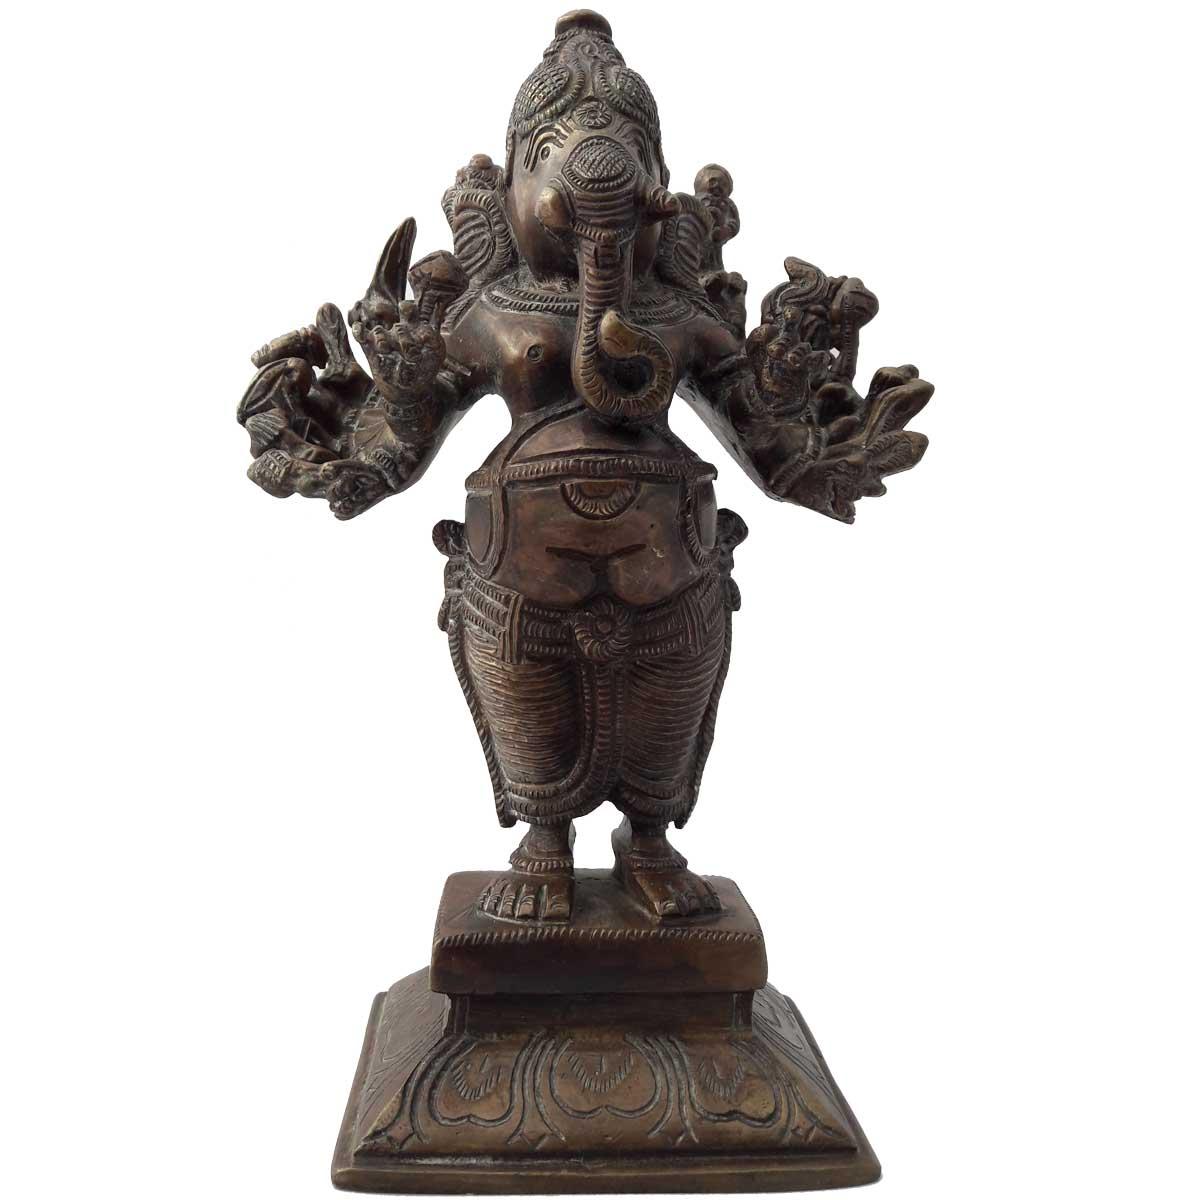 Elephant En Inde Signification statue ganesh ou ganapati en bronze